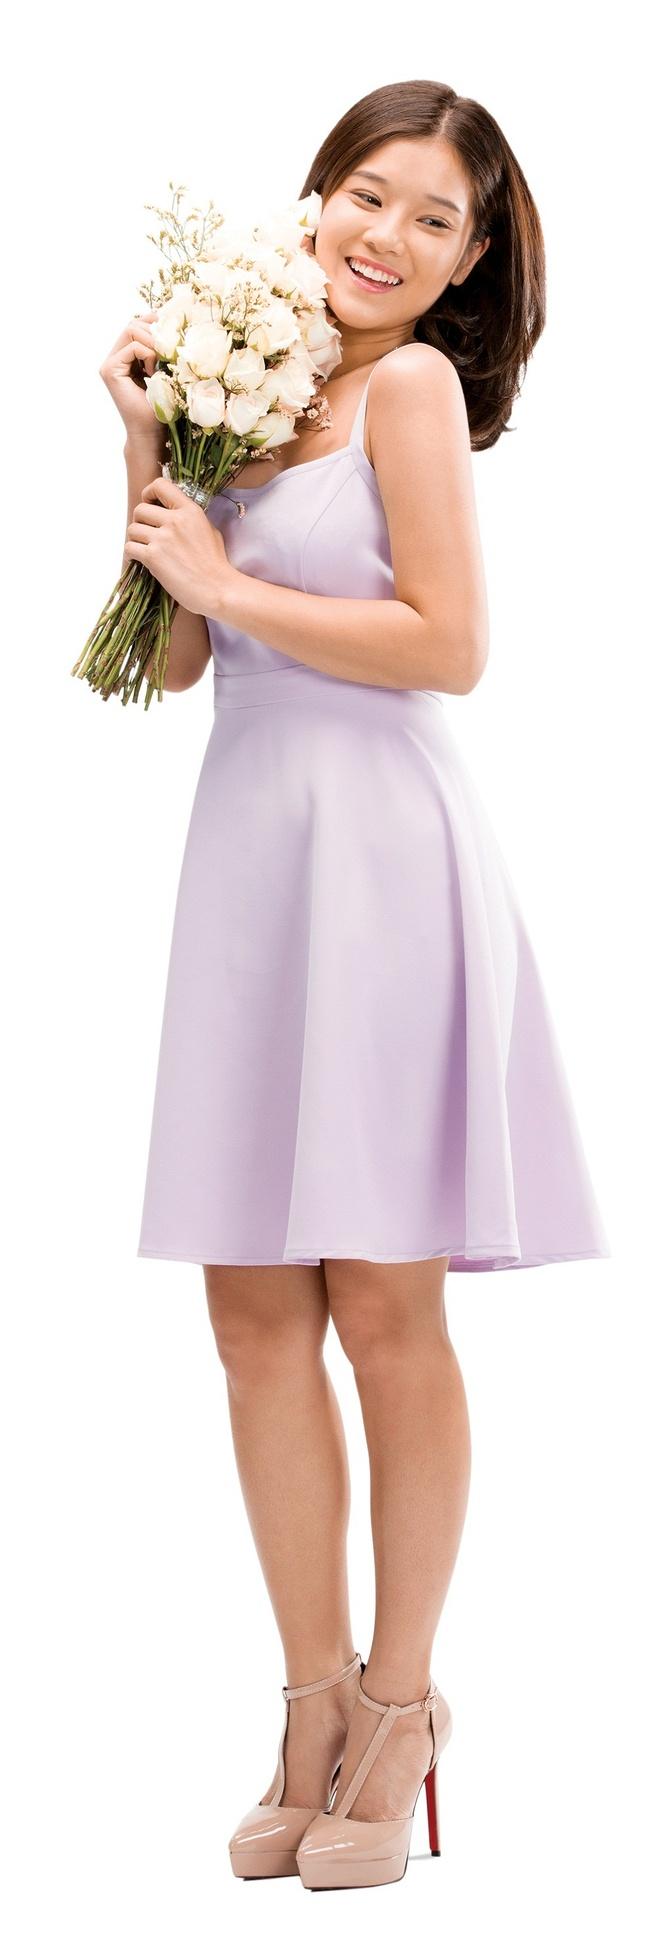 Hoang Yen Chibi bien hoa da phong cach hinh anh 2